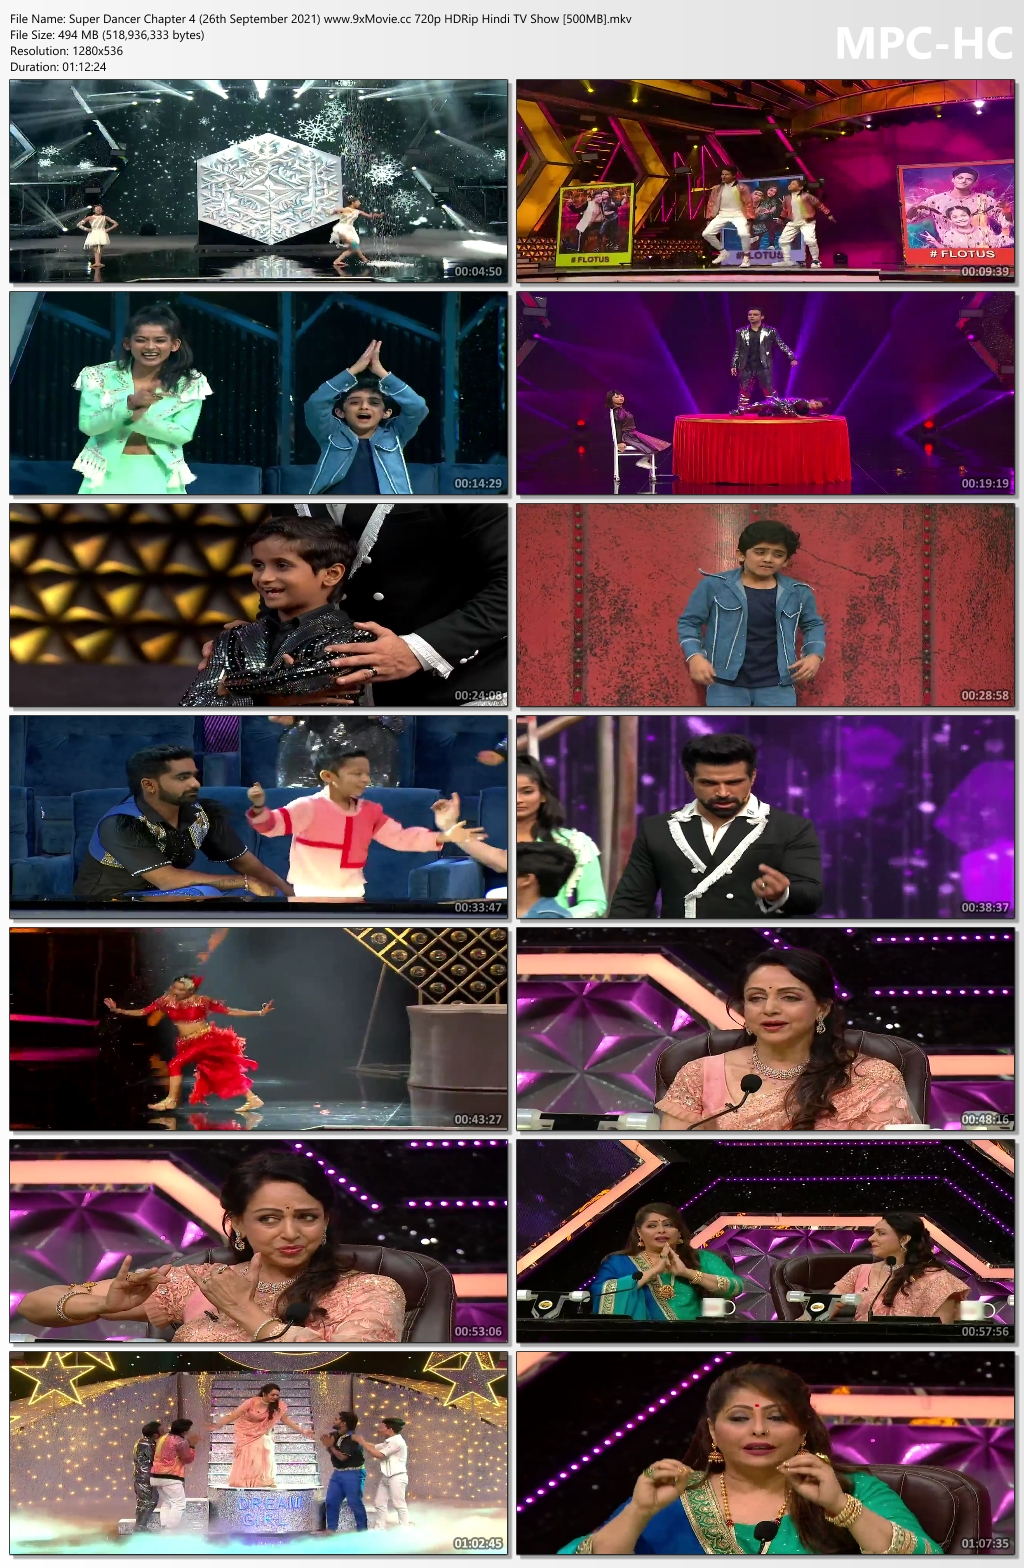 Super-Dancer-Chapter-4-26th-September-2021-www-9x-Movie-cc-720p-HDRip-Hindi-TV-Show-500-MB-mkv